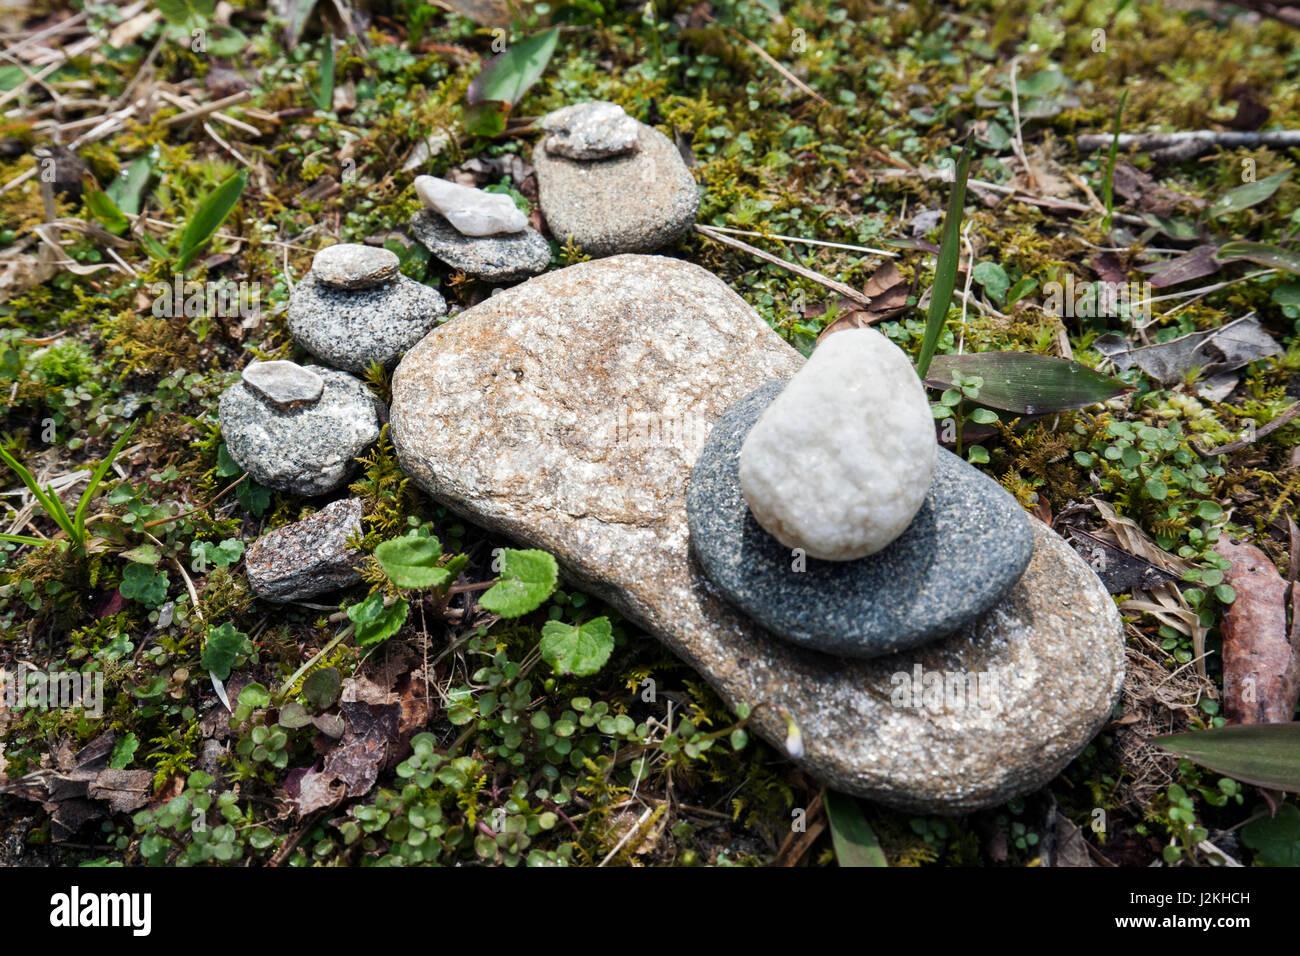 Stone Foot Rock Art - Pisgah National Forest, near Brevard, North Carolina, USA - Stock Image